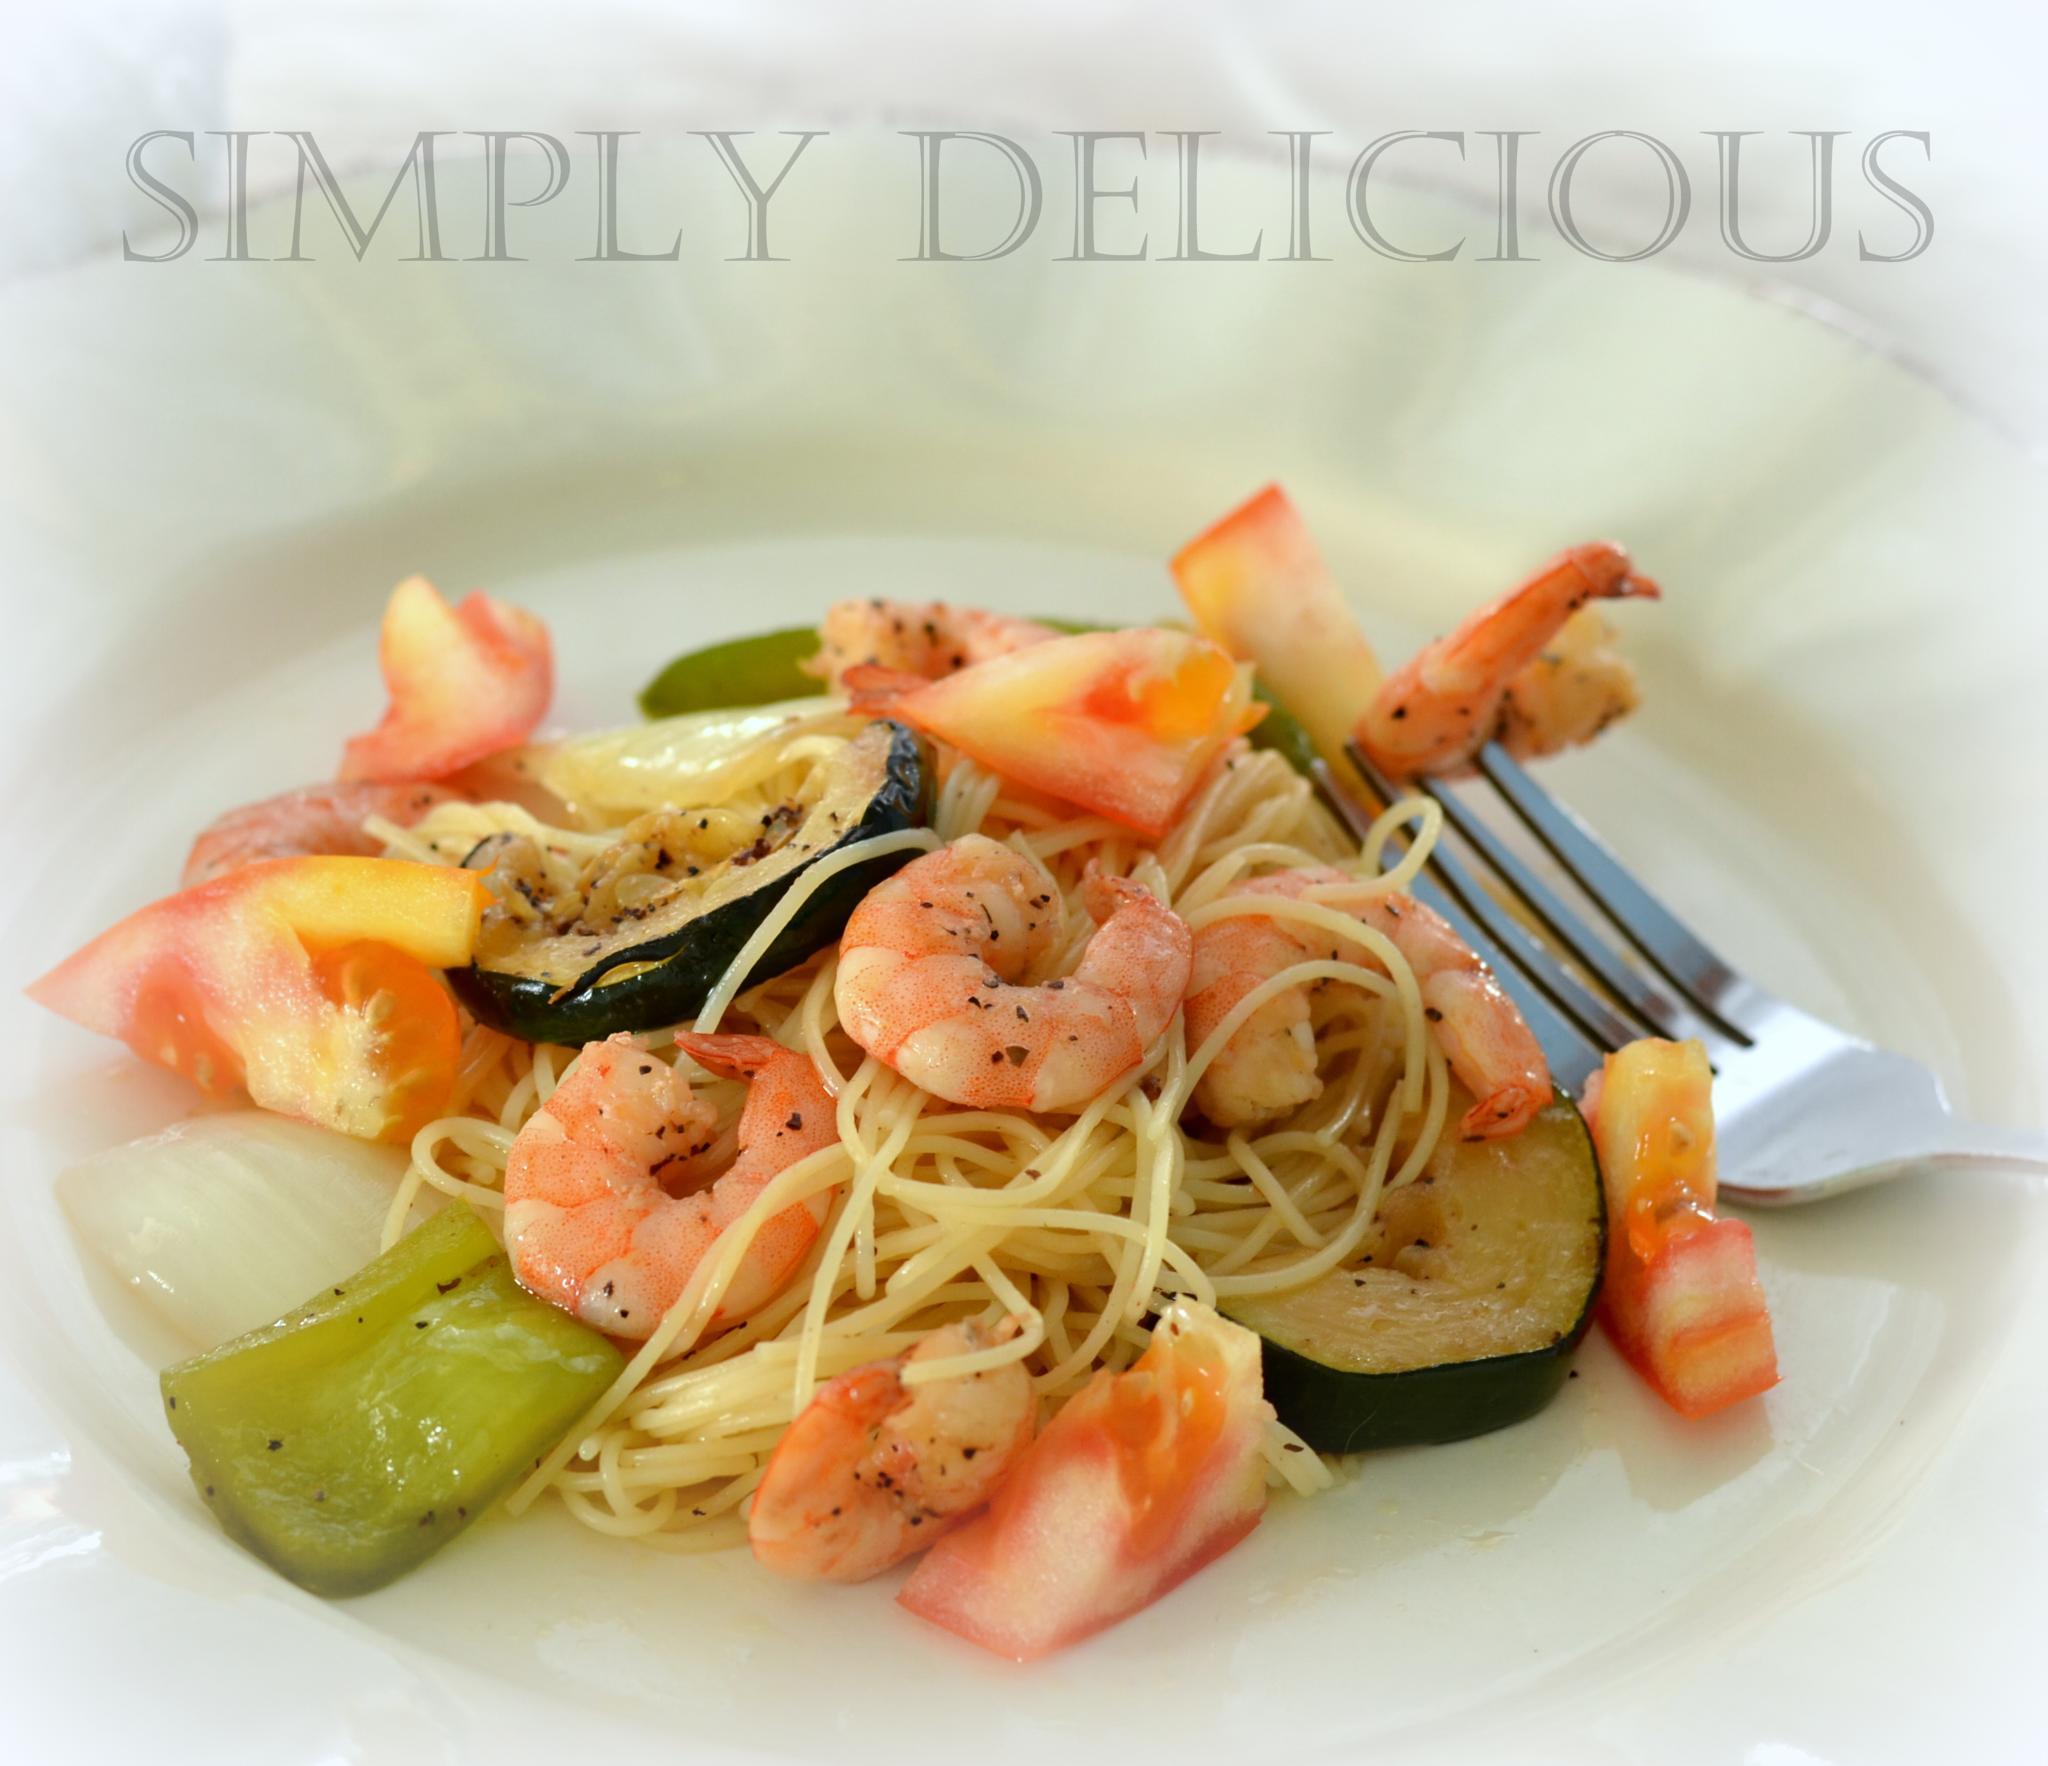 Shrimp Lunch by khauser